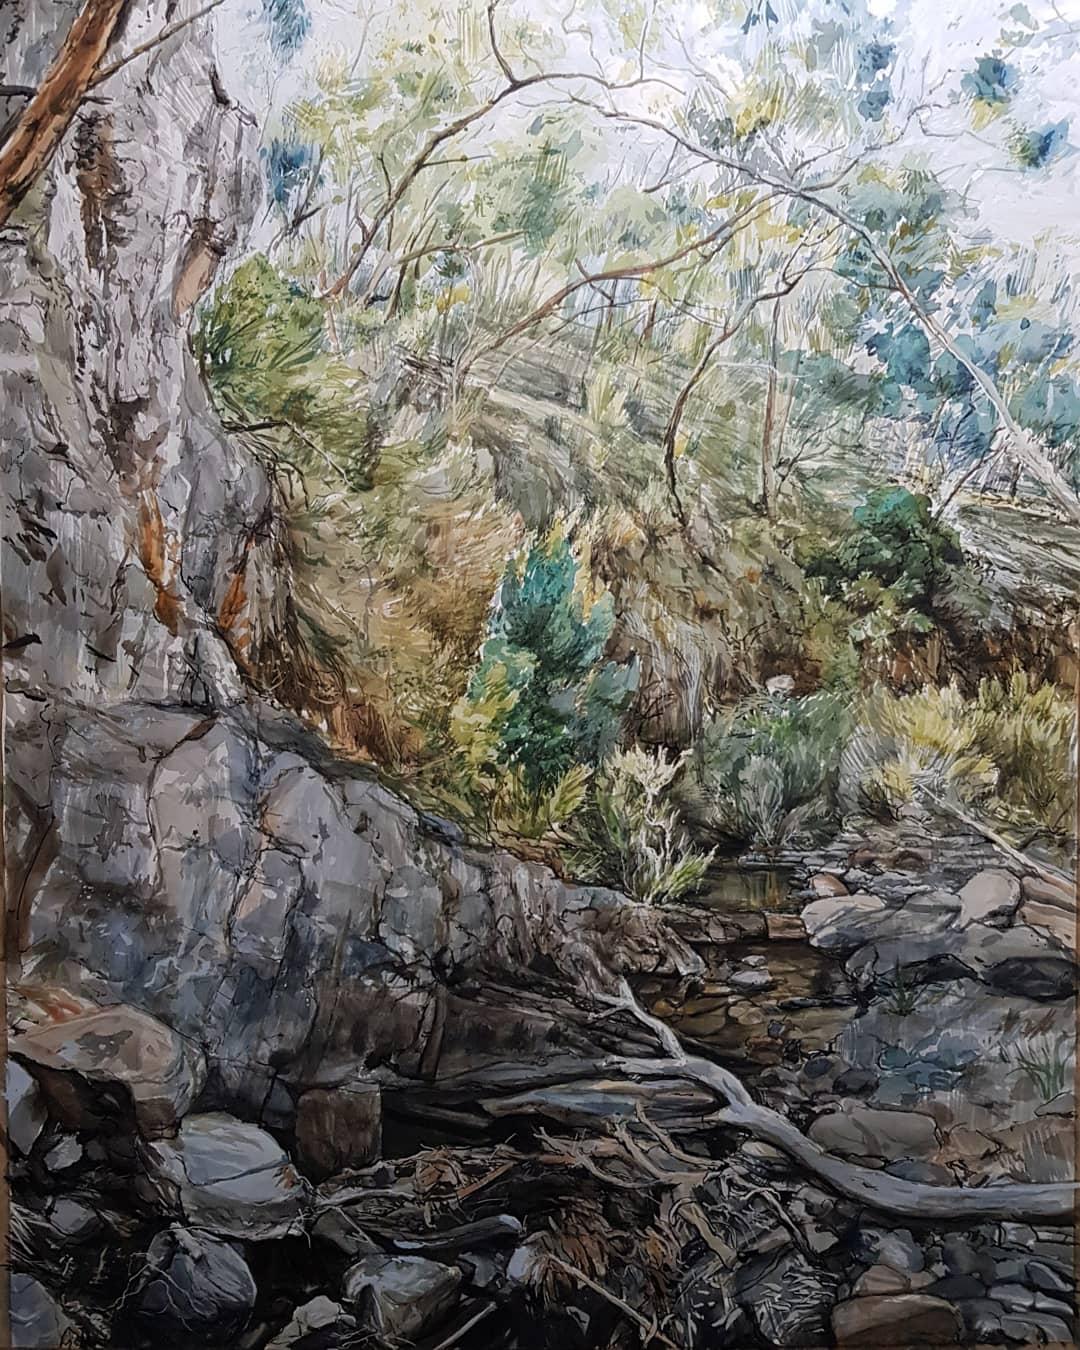 Art Atrium Phillip Edwards - Creek bower and I am that bird